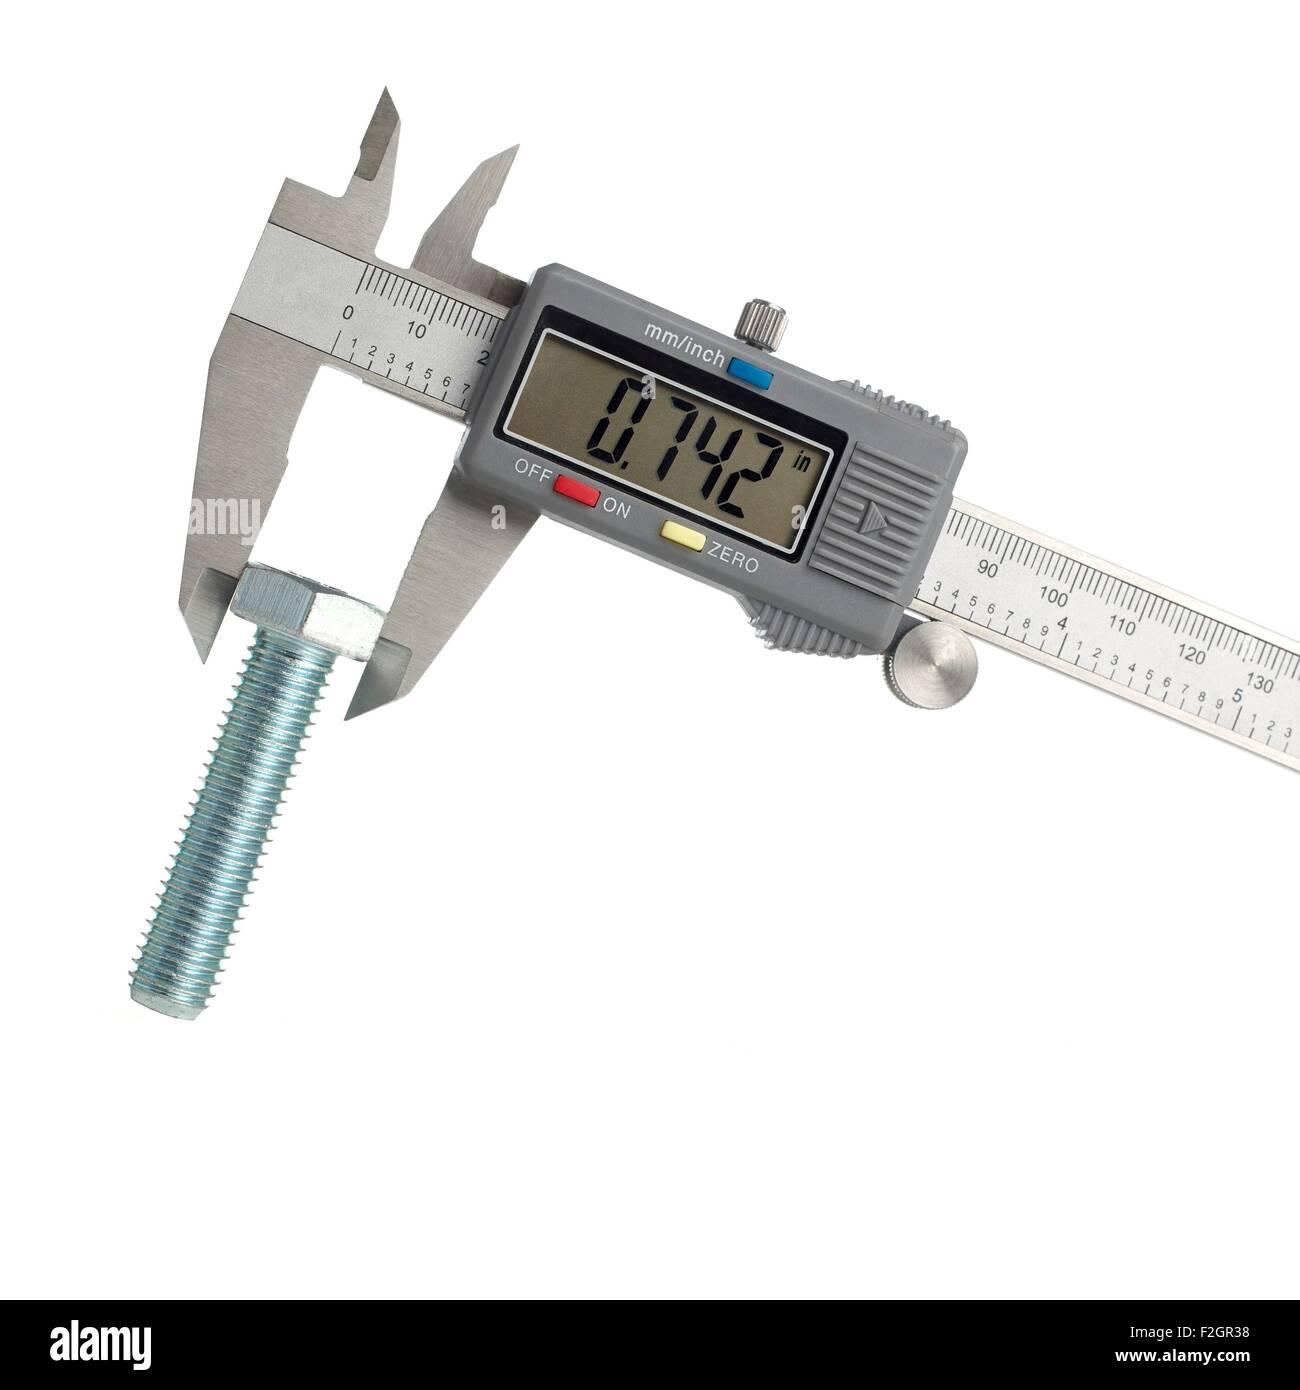 Digital caliper measuring a bolt - Stock Image